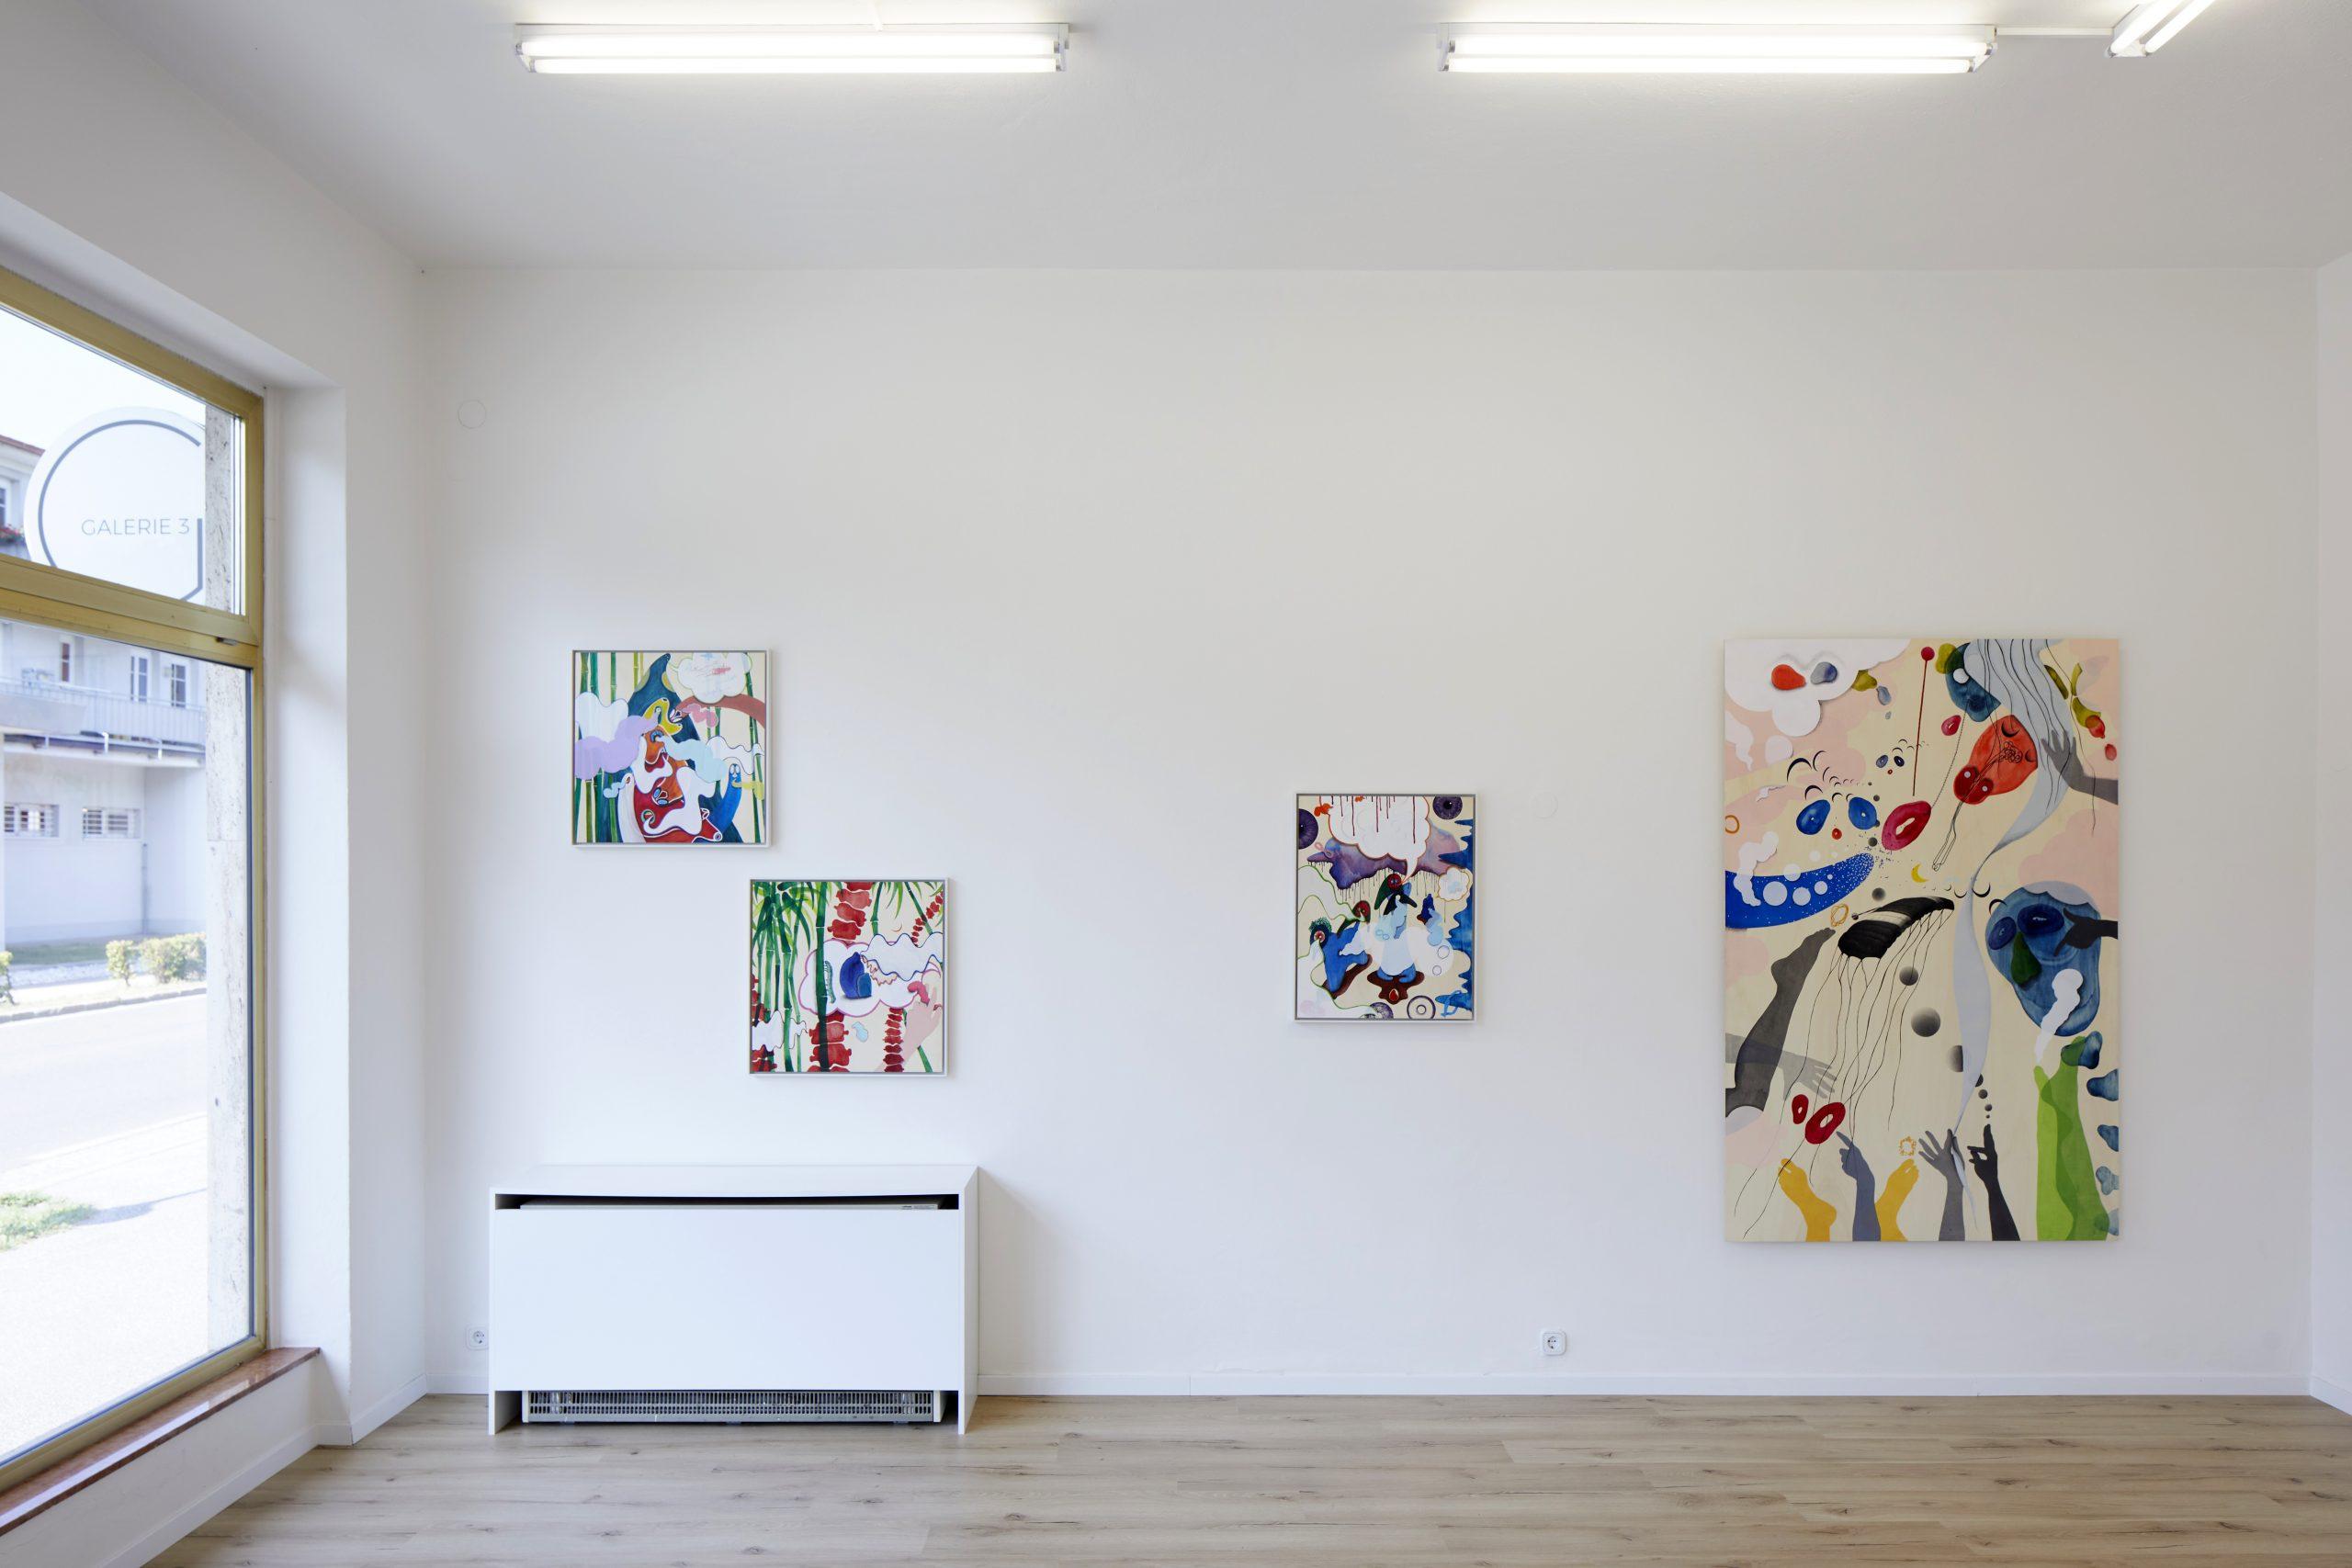 Galerie3/Velden 2021, Foto: copyright Johannes Puch